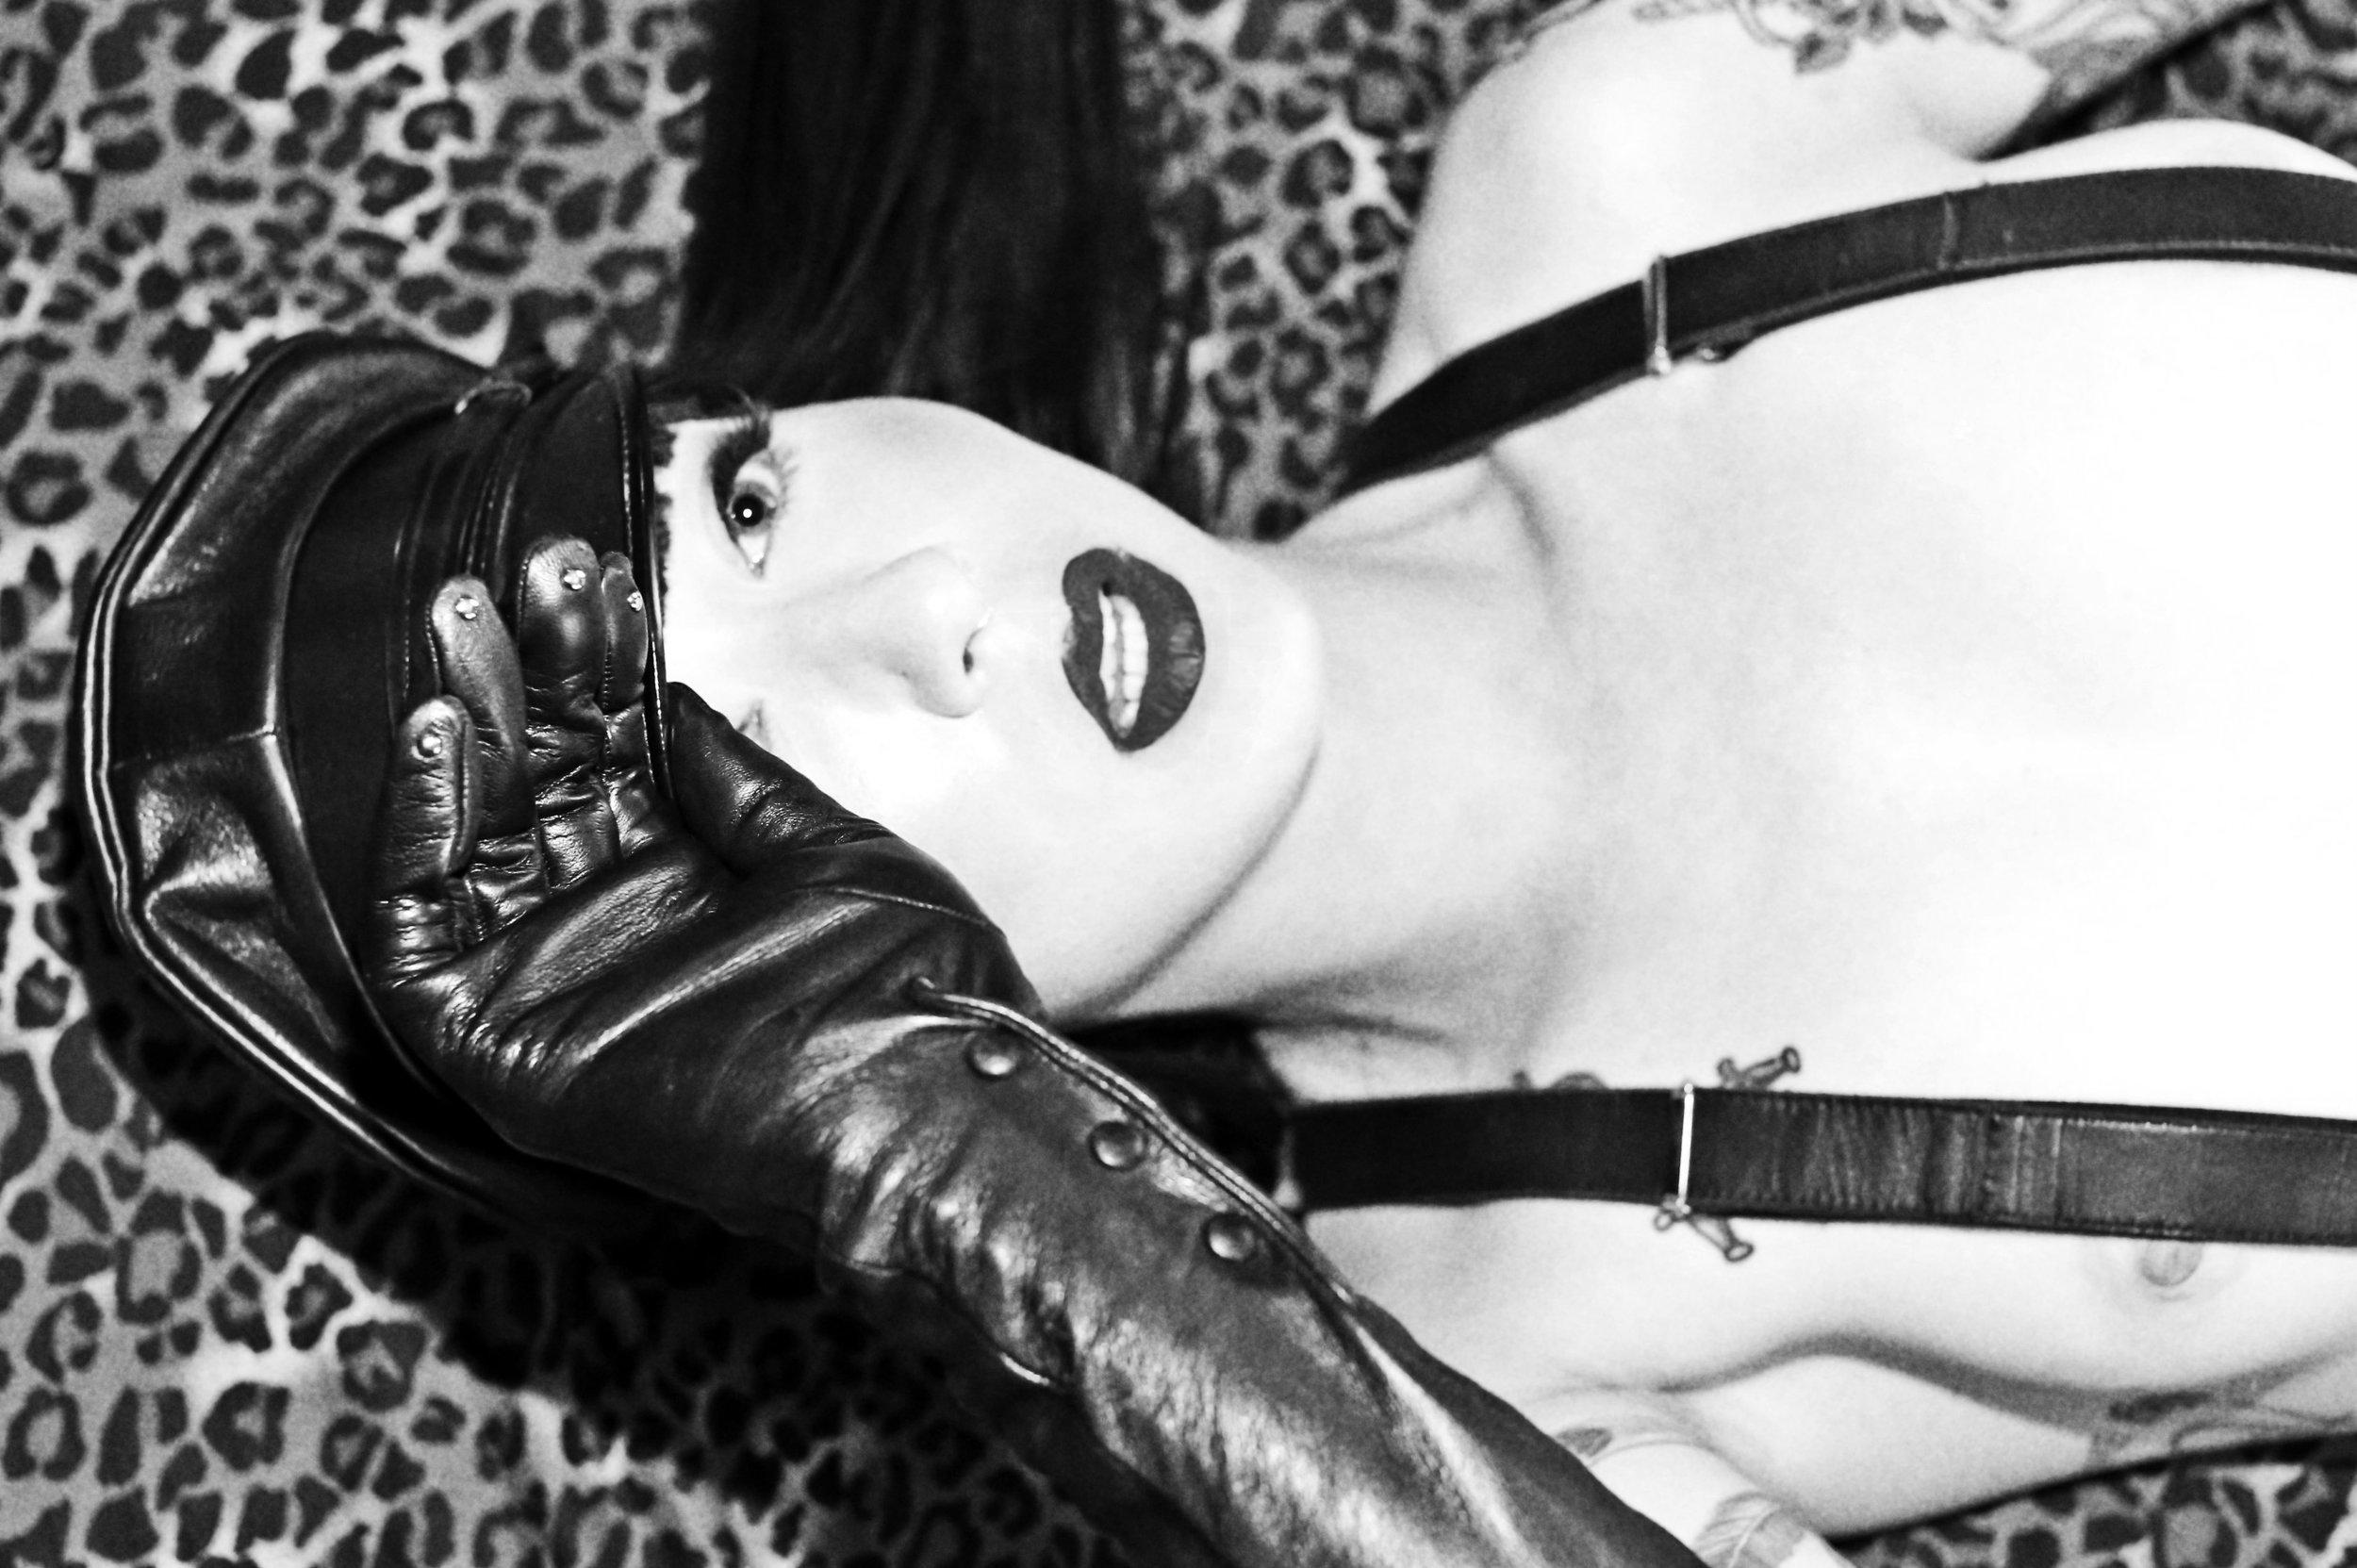 Mistress_Ramona_Leather_NightPorter_dominatrix_leather_daddy.jpeg